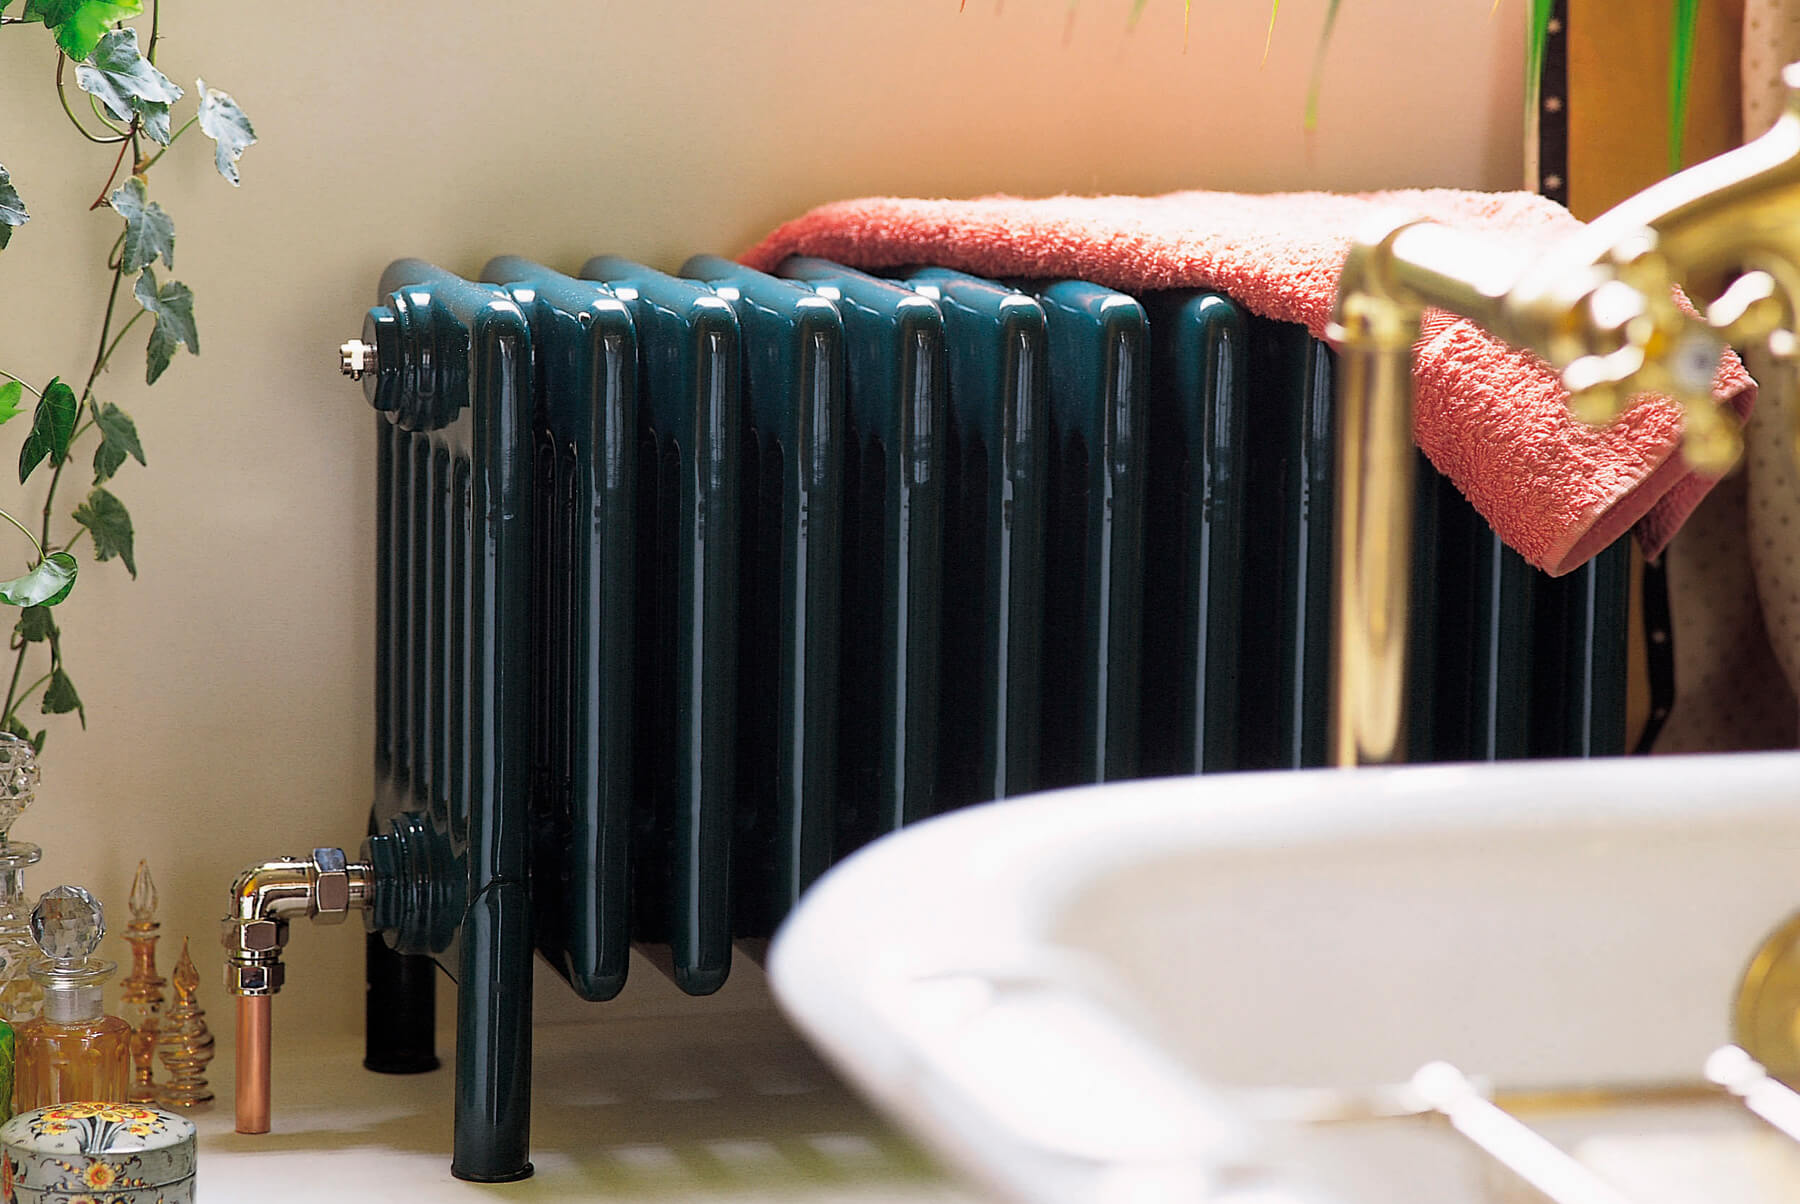 Radiators-&-Towel-Warmers-BISQUE-CLASSIC-INSET-1-1800x1204